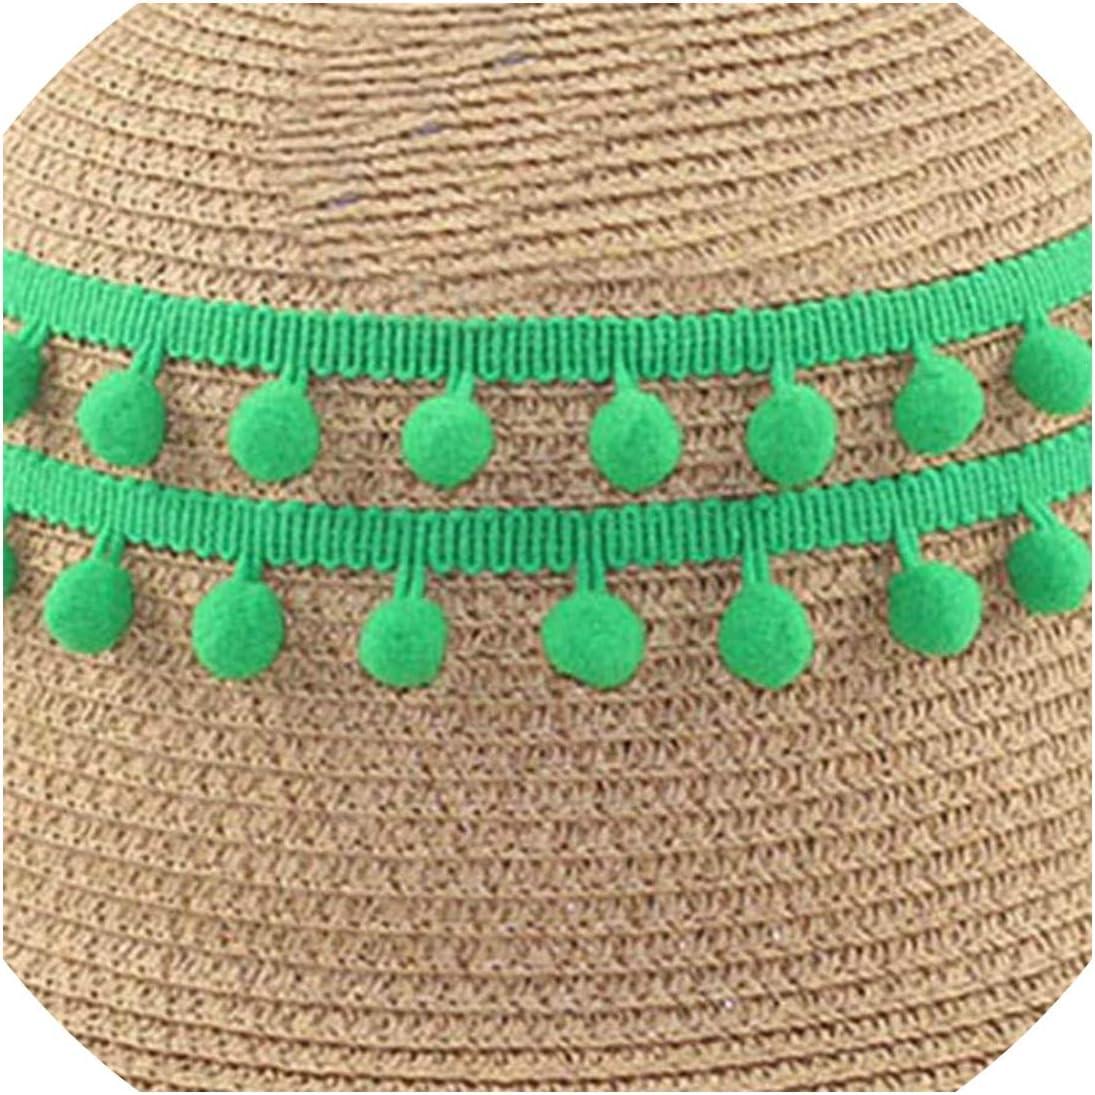 DIY Craft 20Yards//Lot Pompom Trim Pom Decoration Tassel Ball Fringe Ribbon Home Decoration Material Apparel Sewing Accessories,No.1